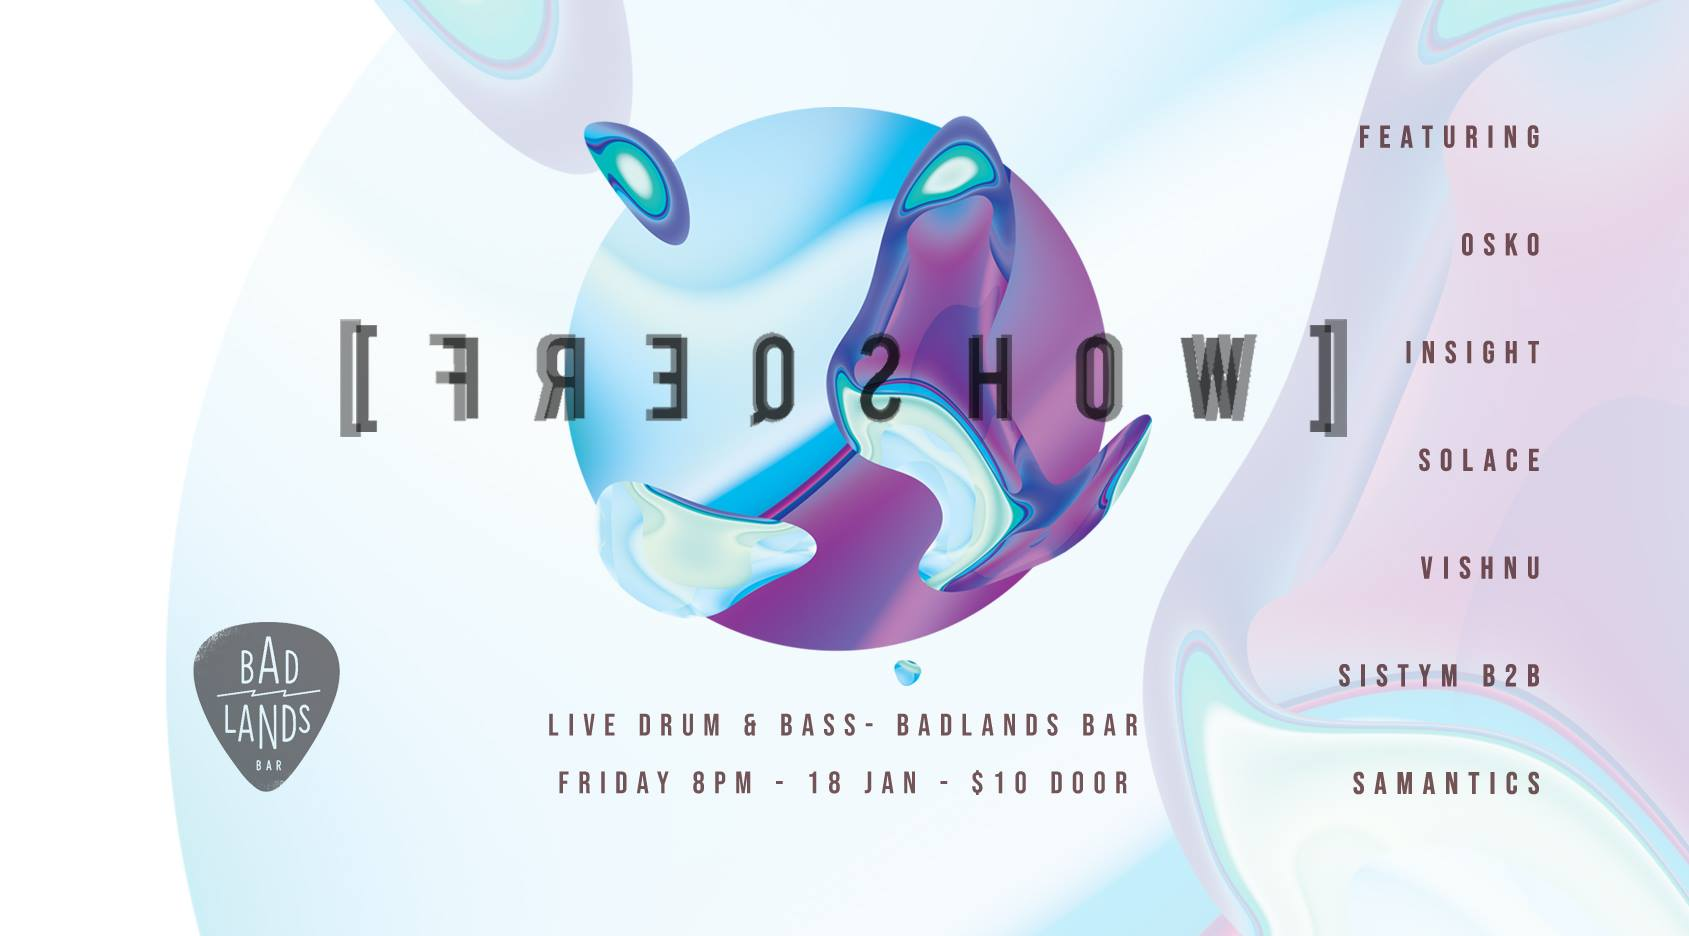 Freqshow + Local DJs at Badlands Bar